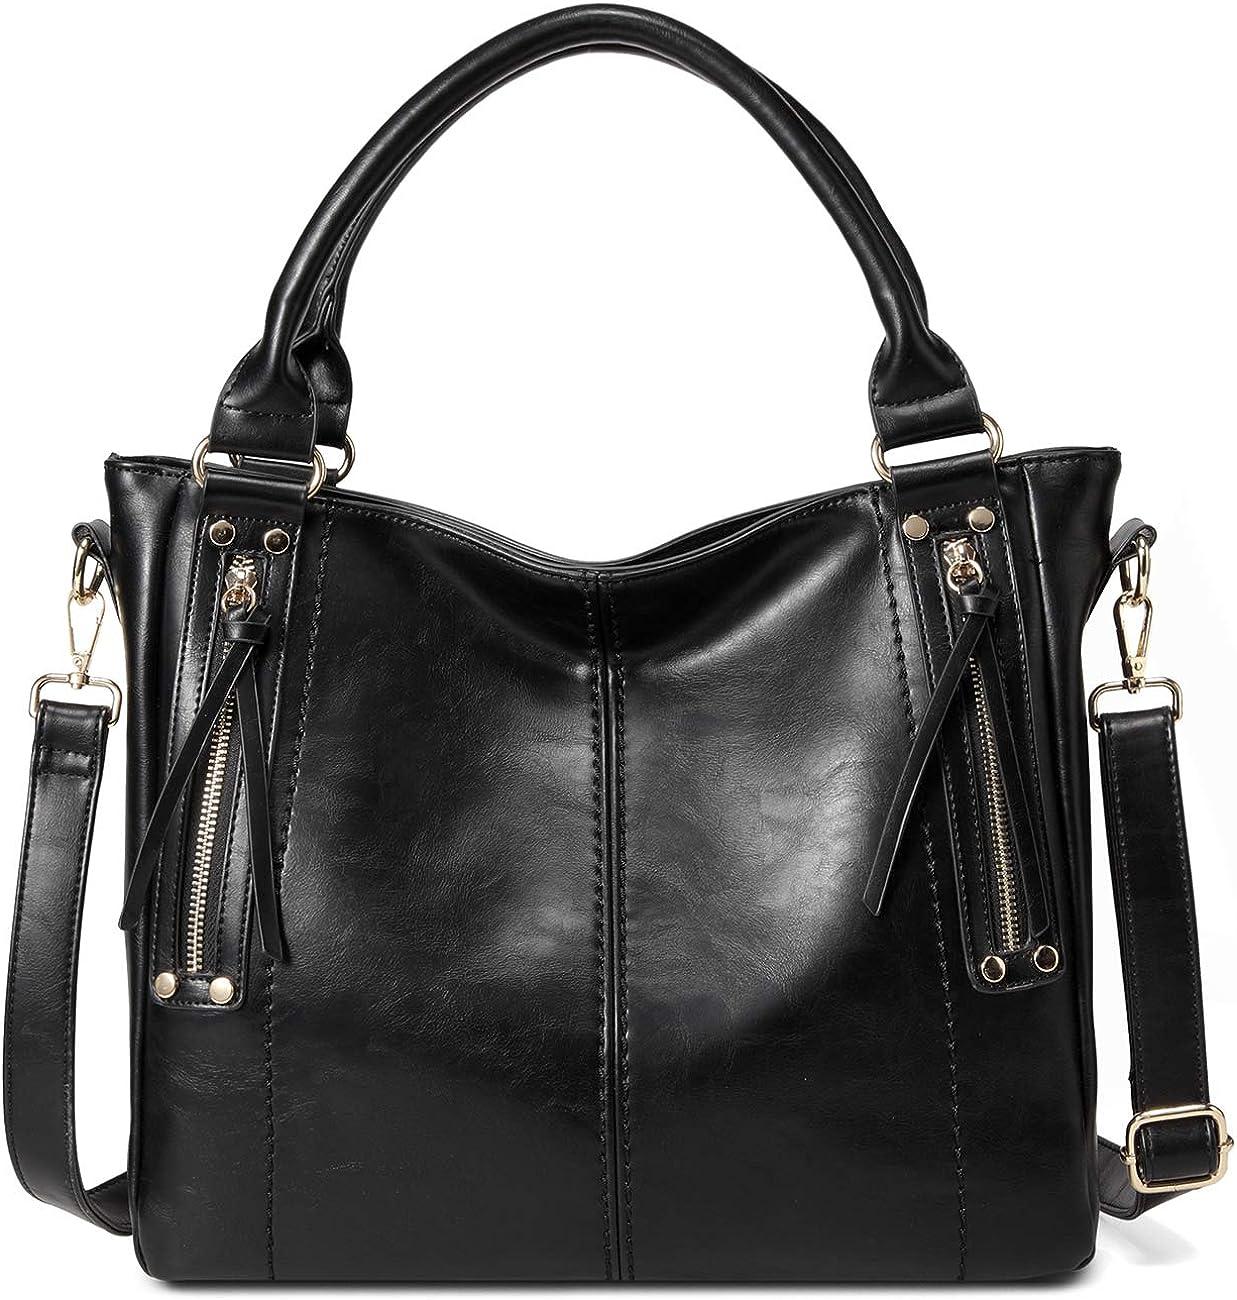 Hobo Bags for Women, VASCHY Fashion Faux Leather Handbag for Ladies Tote Shoulder Bag with Detachable Shoulder Strap